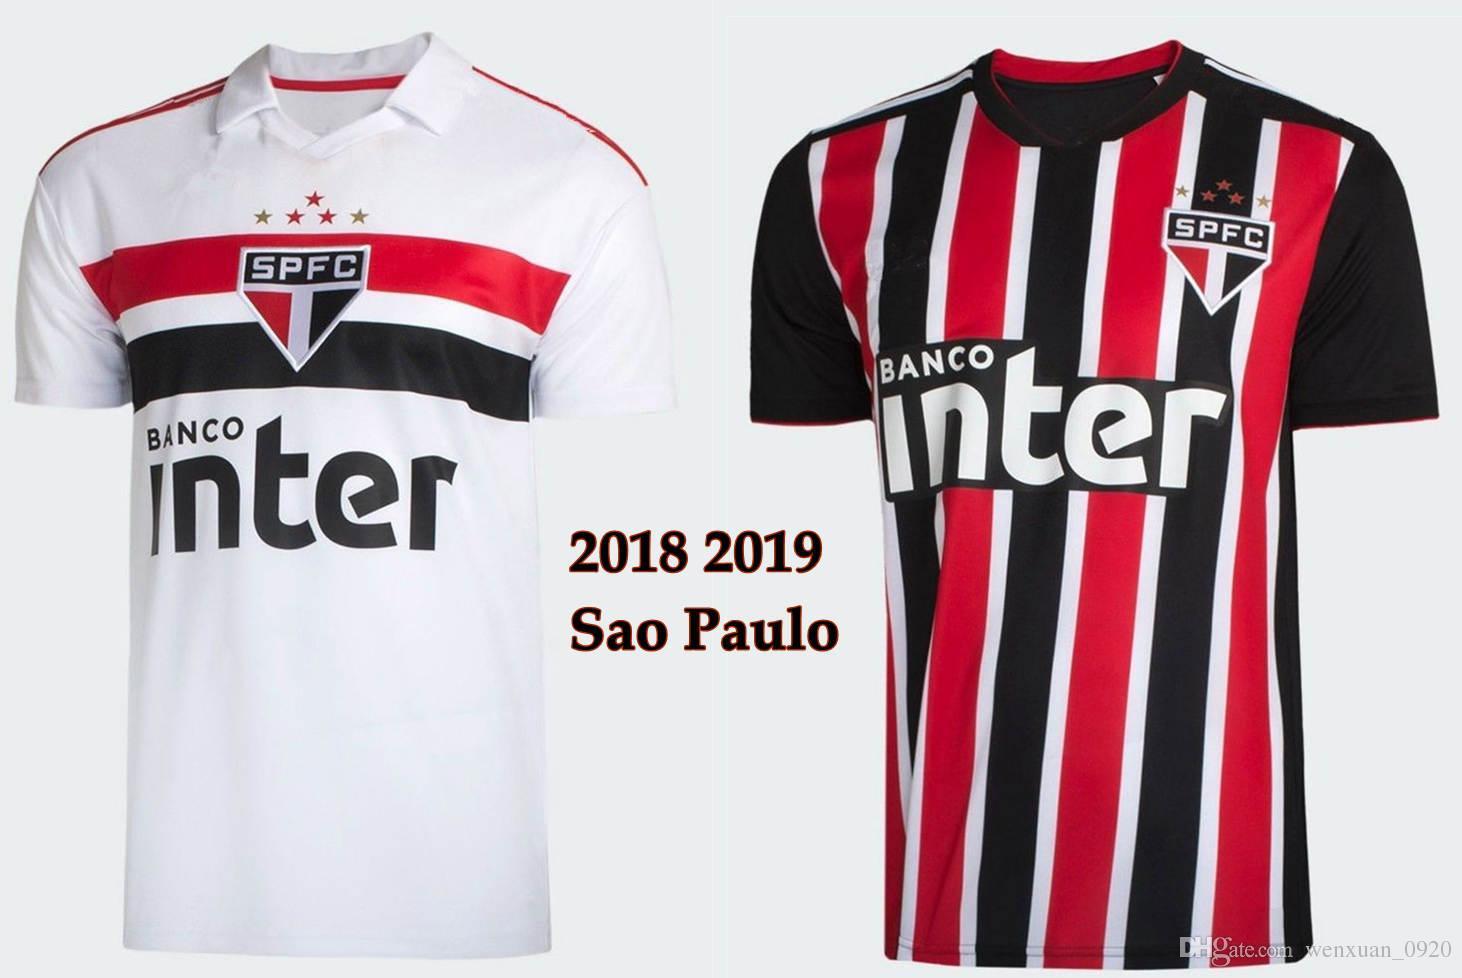 8492b671d 2019 2018 2019 Sao Paulo Soccer Jerseys Thai Quality Home Away Shirts 18 19  Sao Paulo Shirts Football Shirts From Wenxuan 0920